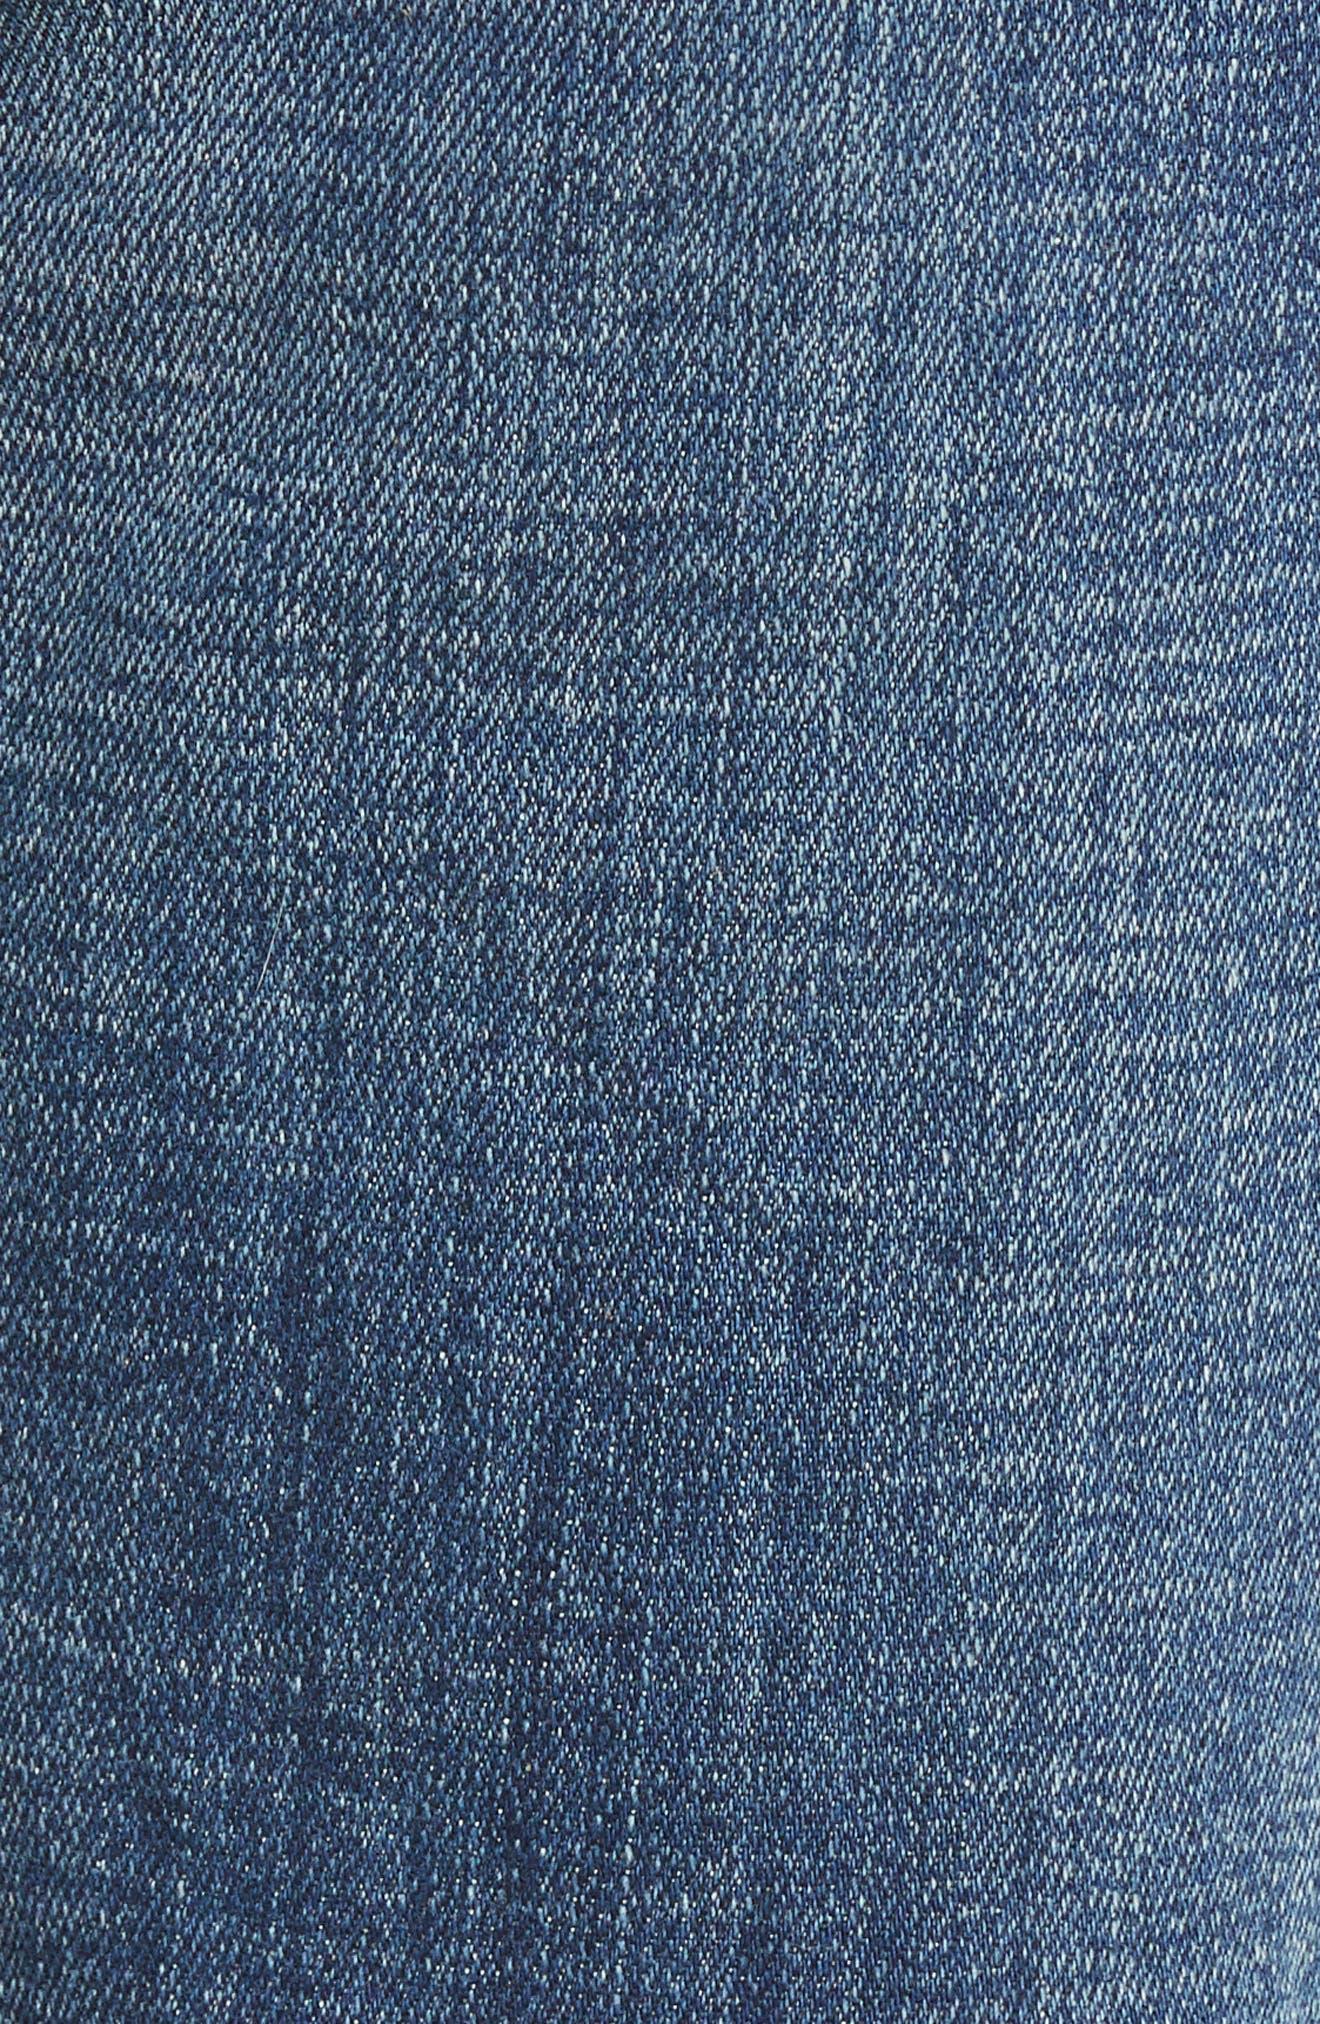 Halle Mid Rise Super Skinny Jeans,                             Alternate thumbnail 6, color,                             Esqm Gen Y